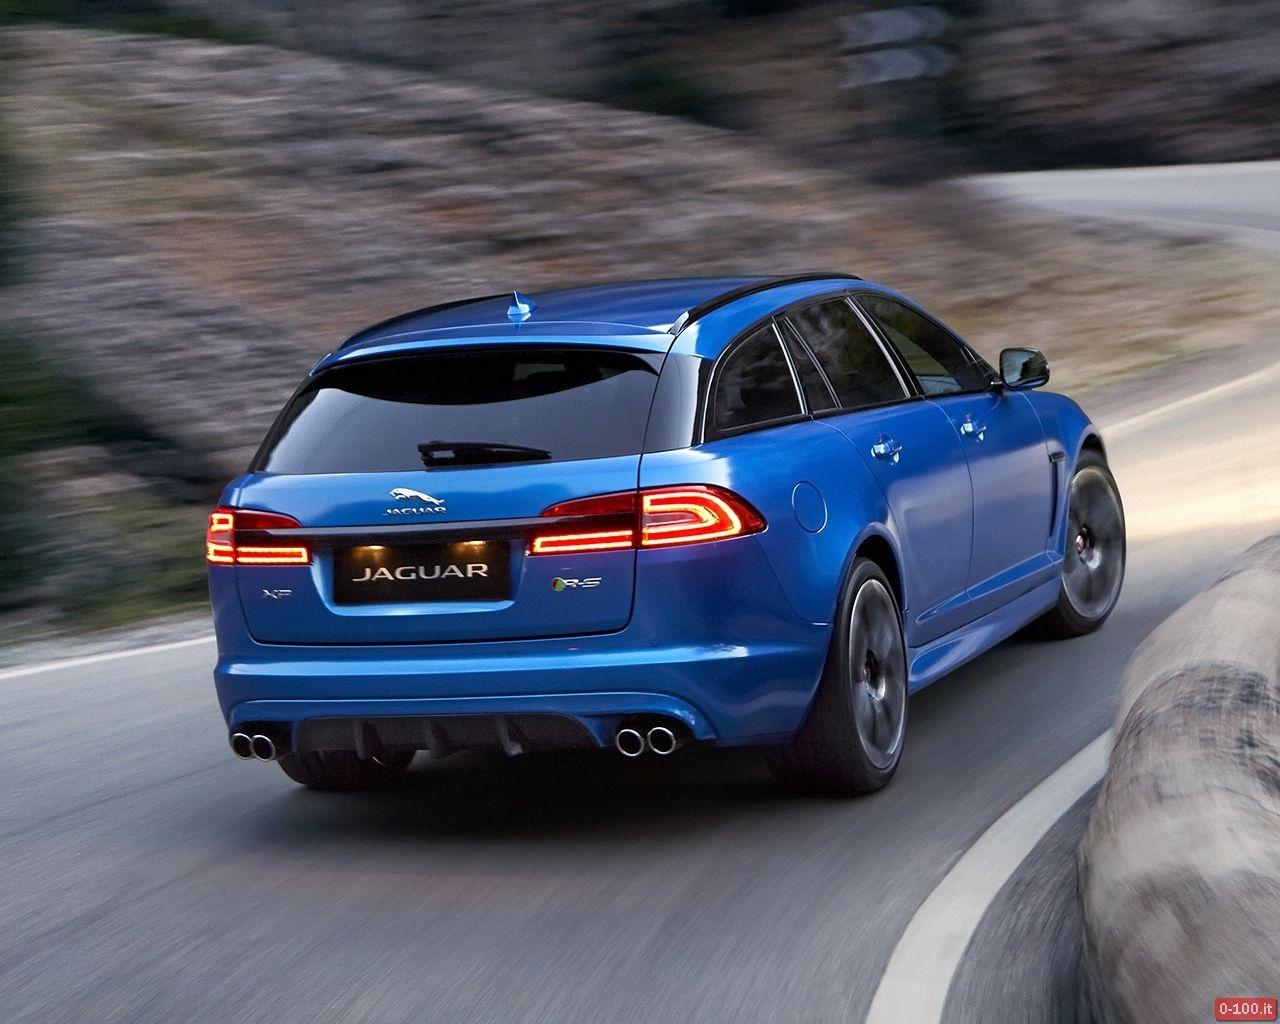 ginevra-2014-jaguar-xf-model-year-2015-xfr-s-sportbrake-0-100_2